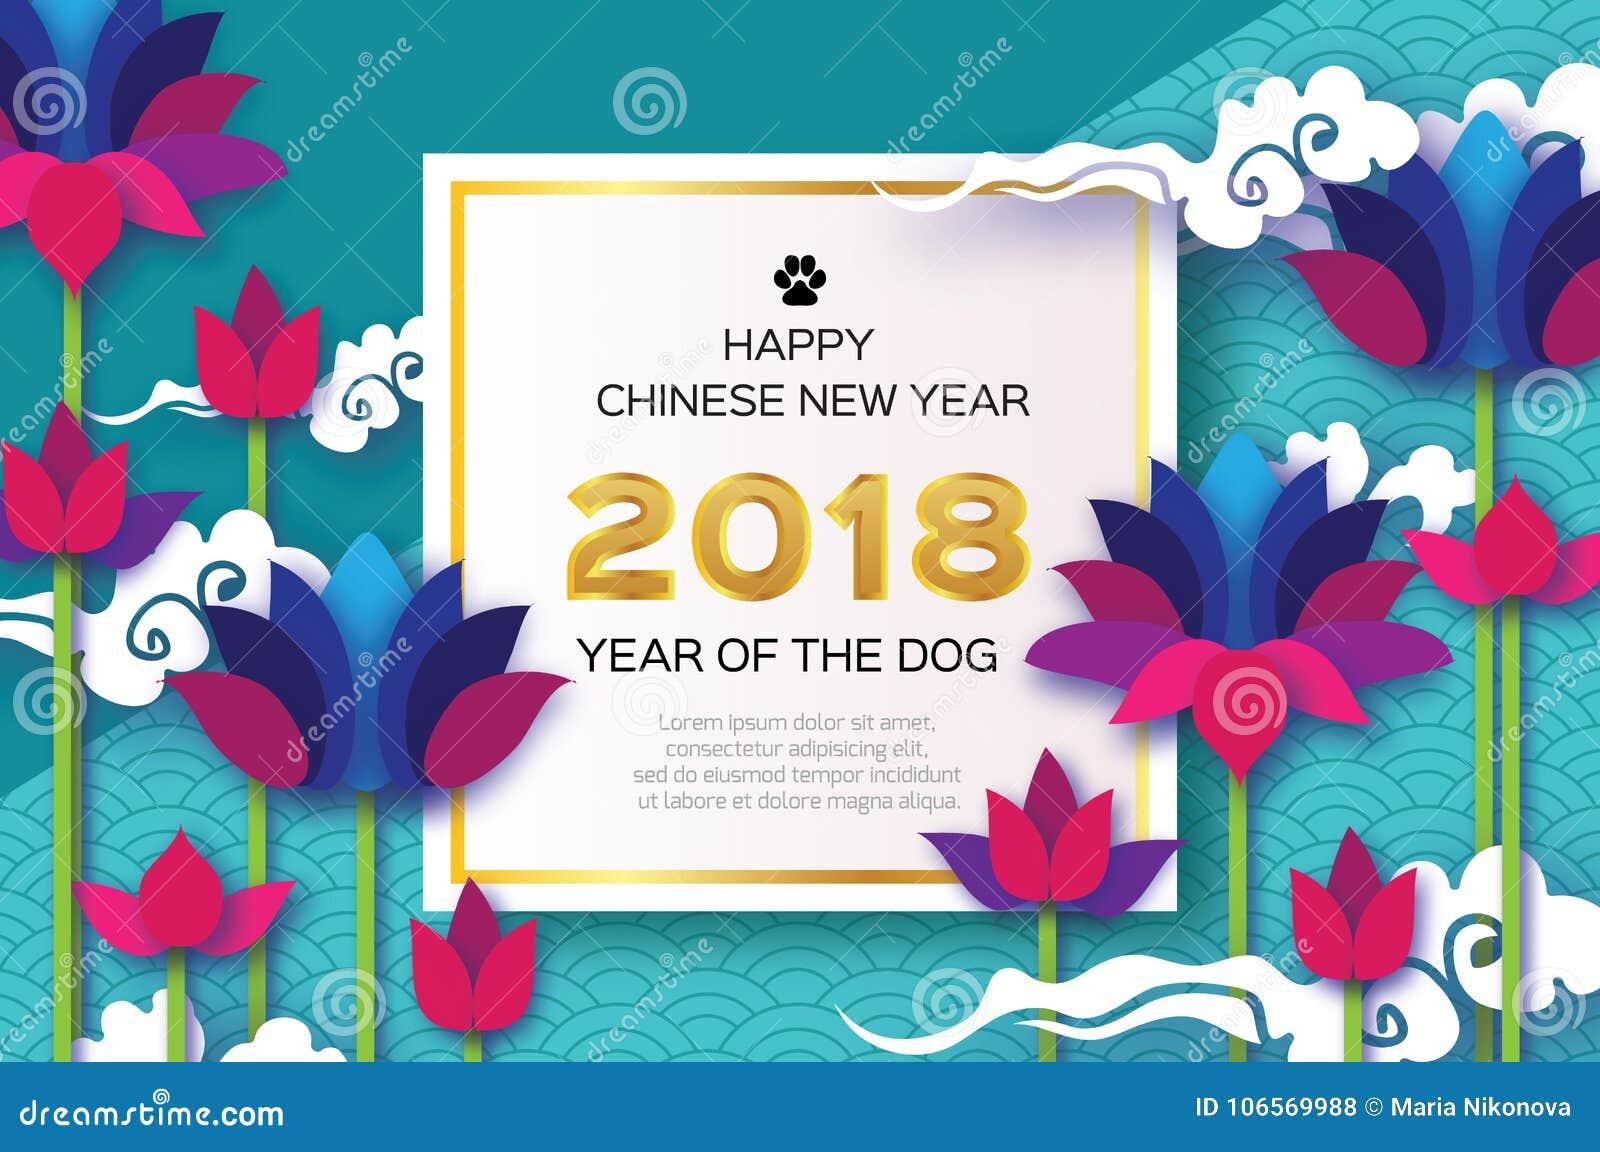 Origami waterlily or lotus flower happy chinese new year 2018 beautiful origami waterlily or lotus flower happy chinese new year 2018 greeting card year izmirmasajfo